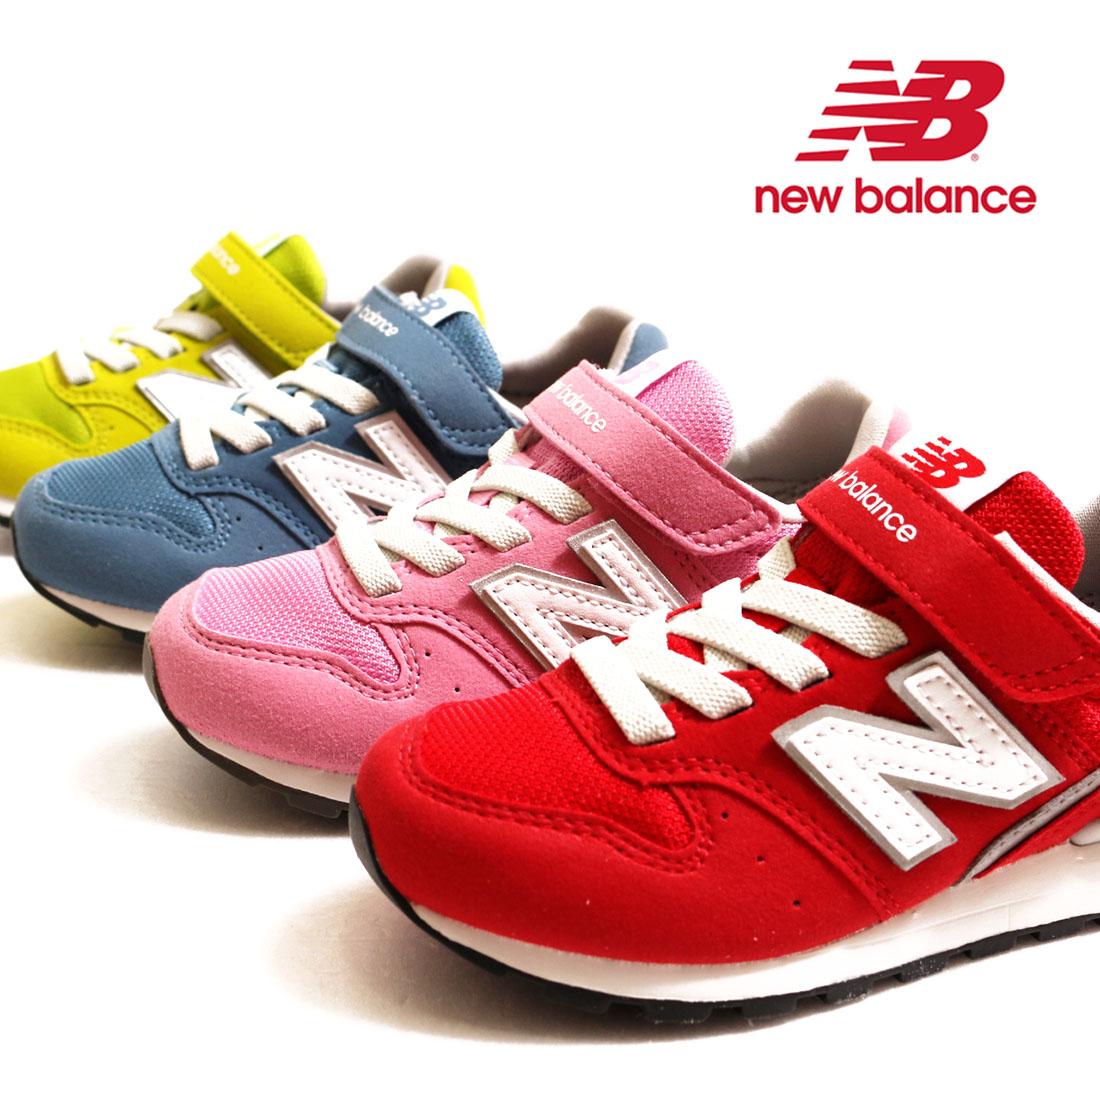 buy popular 033cc 6f2cc New Balance 996 newbalance kids YV996 sneakers (17cm 17.5cm 18.5cm 19cm  19.5cm ...